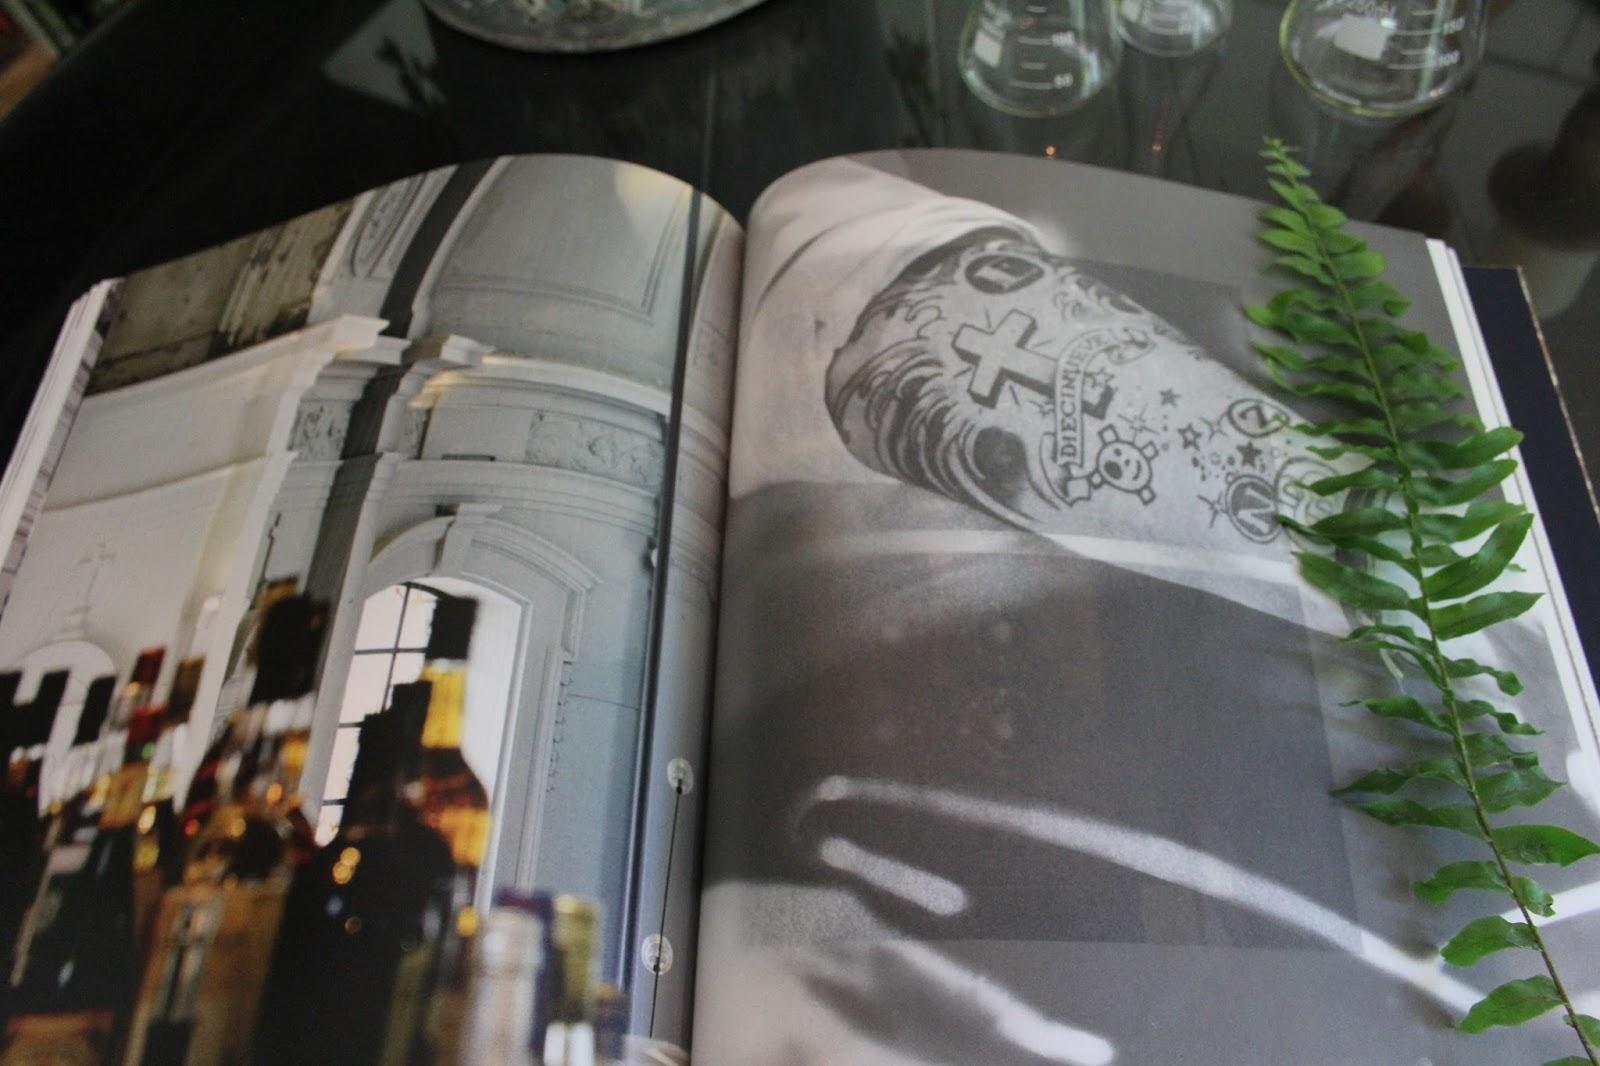 Piet-Boon-Studio-book-the-jane-tattoos-arm